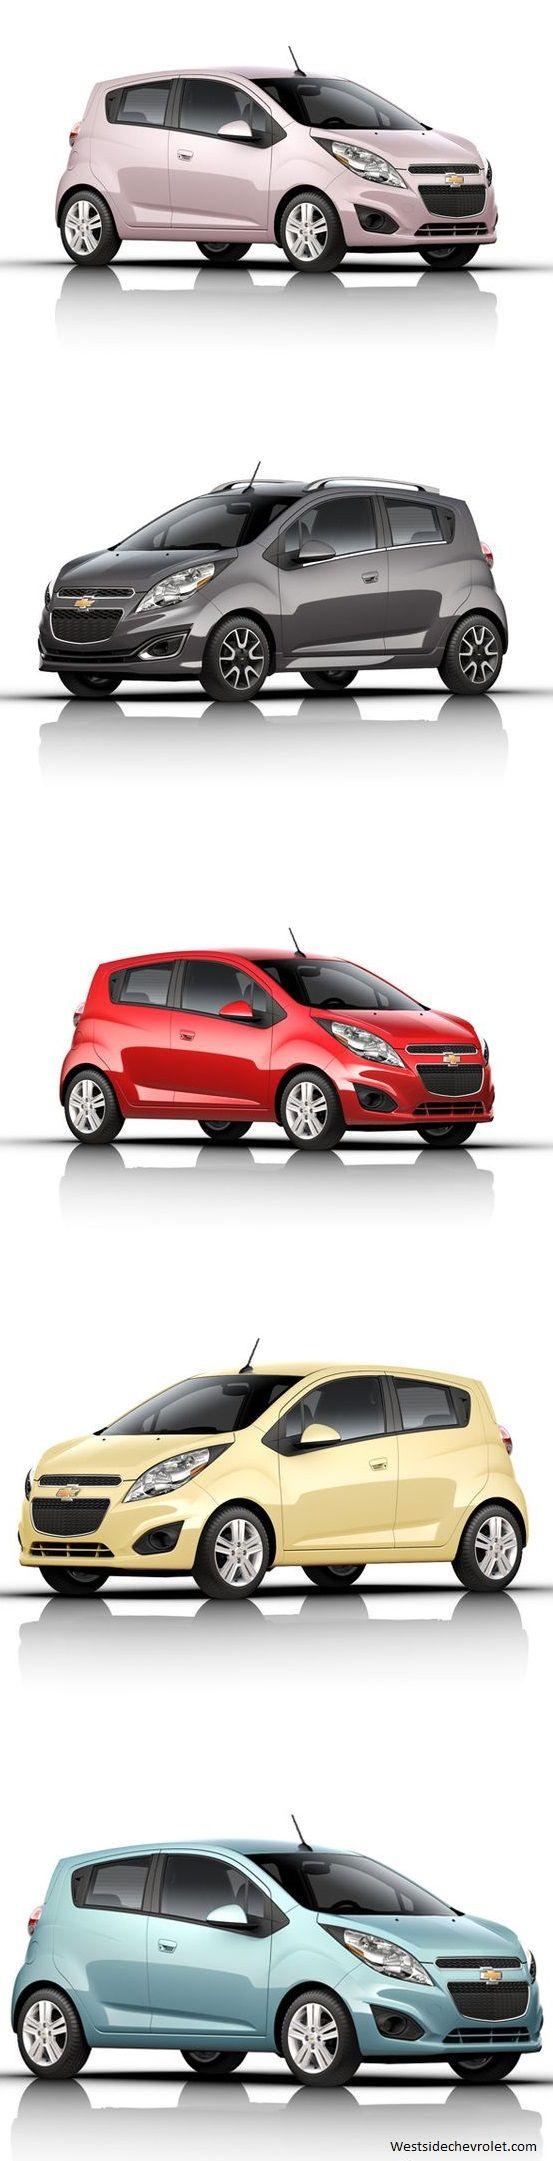 Chevy Spark For sale at Westside Chevrolet Chevrolet